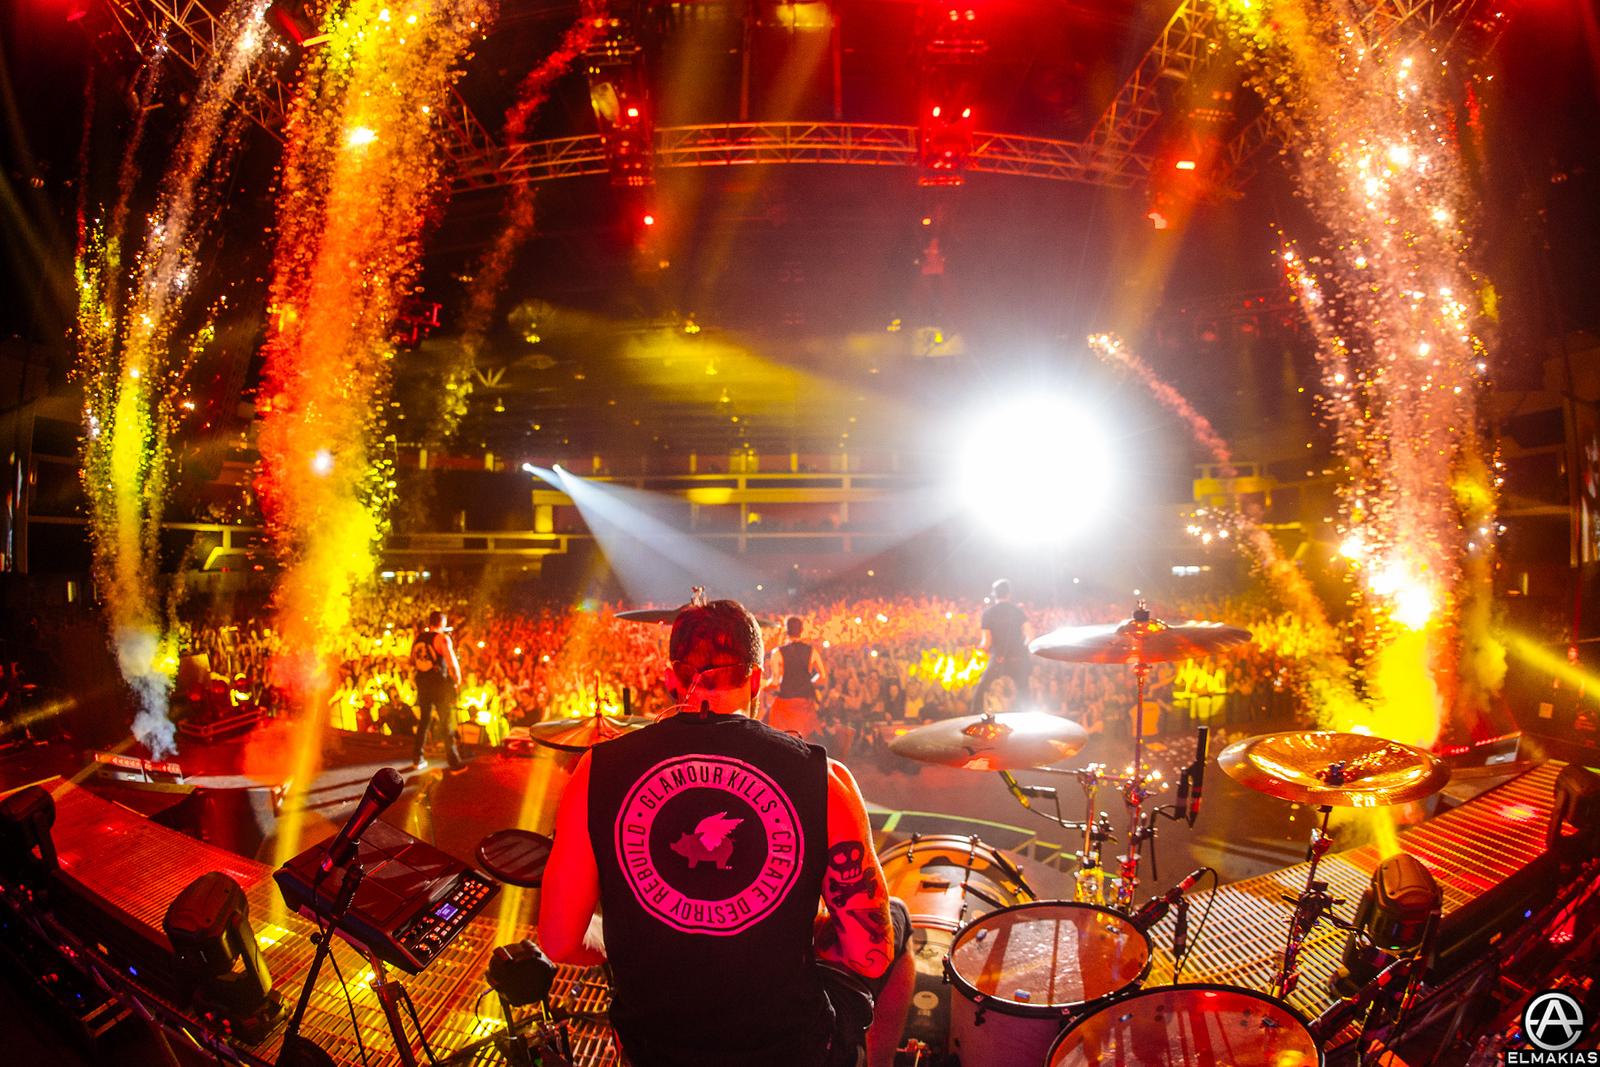 Drummer Remote Cameras